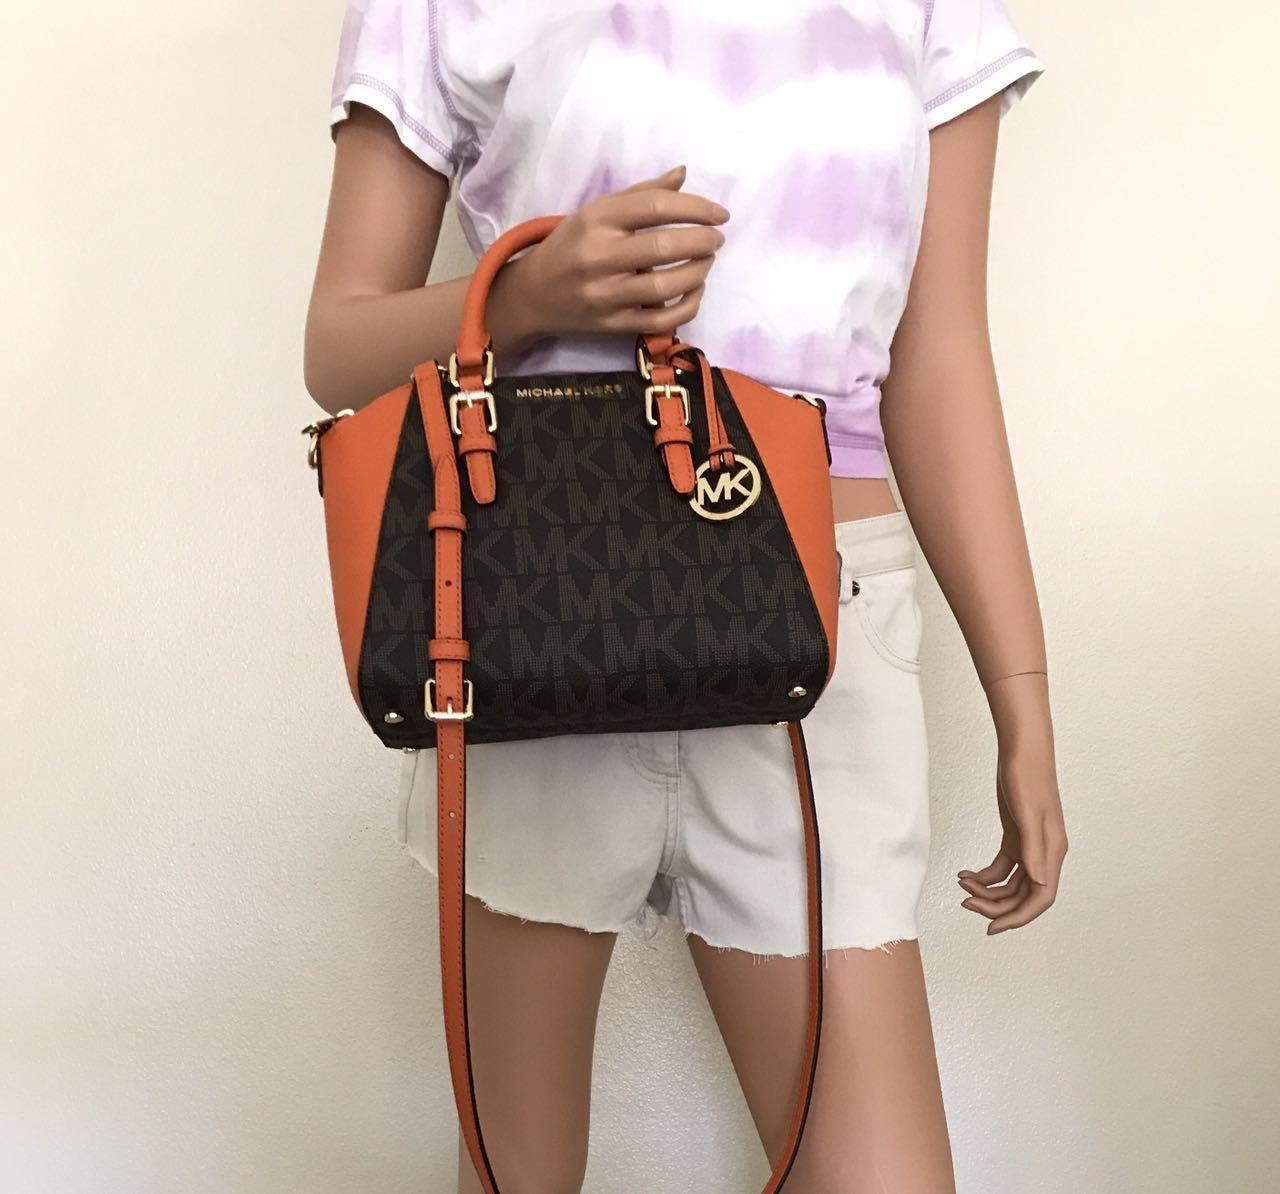 4e8f127f485d NWT Michael Kors Small Brown Leather Ciara Messenger Satchel Crossbody Bag   144.98